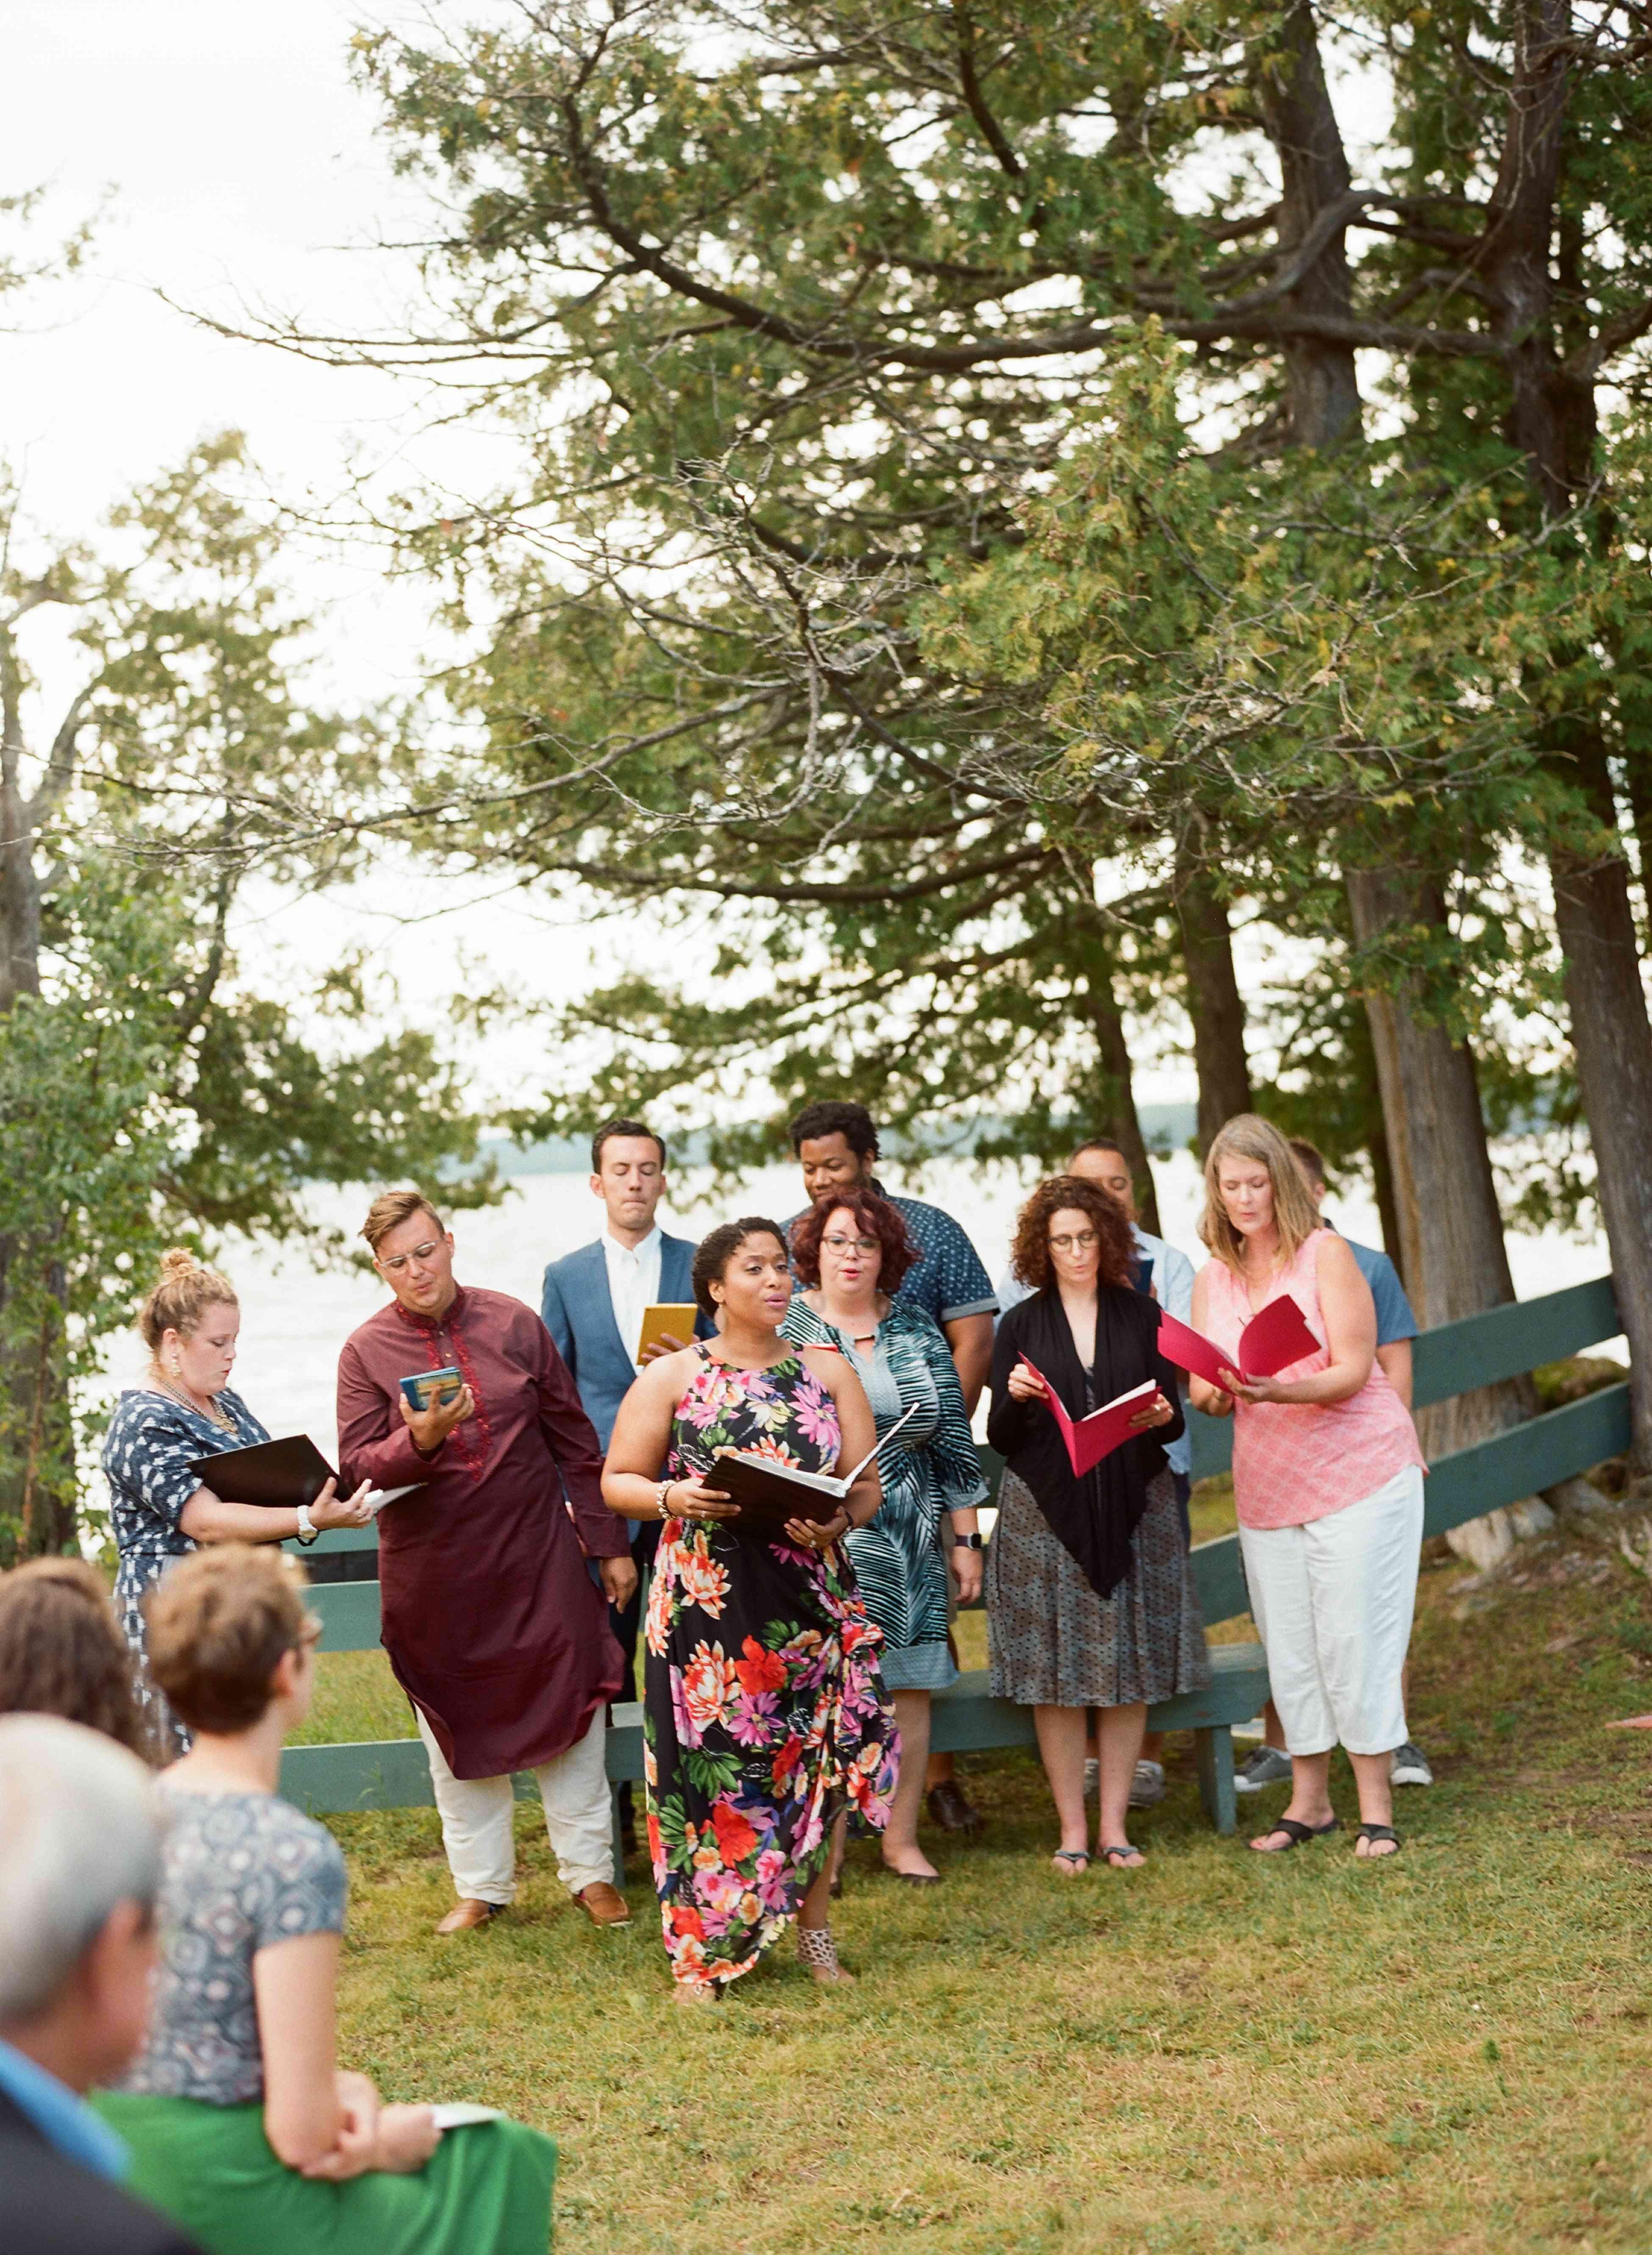 Choir at wedding